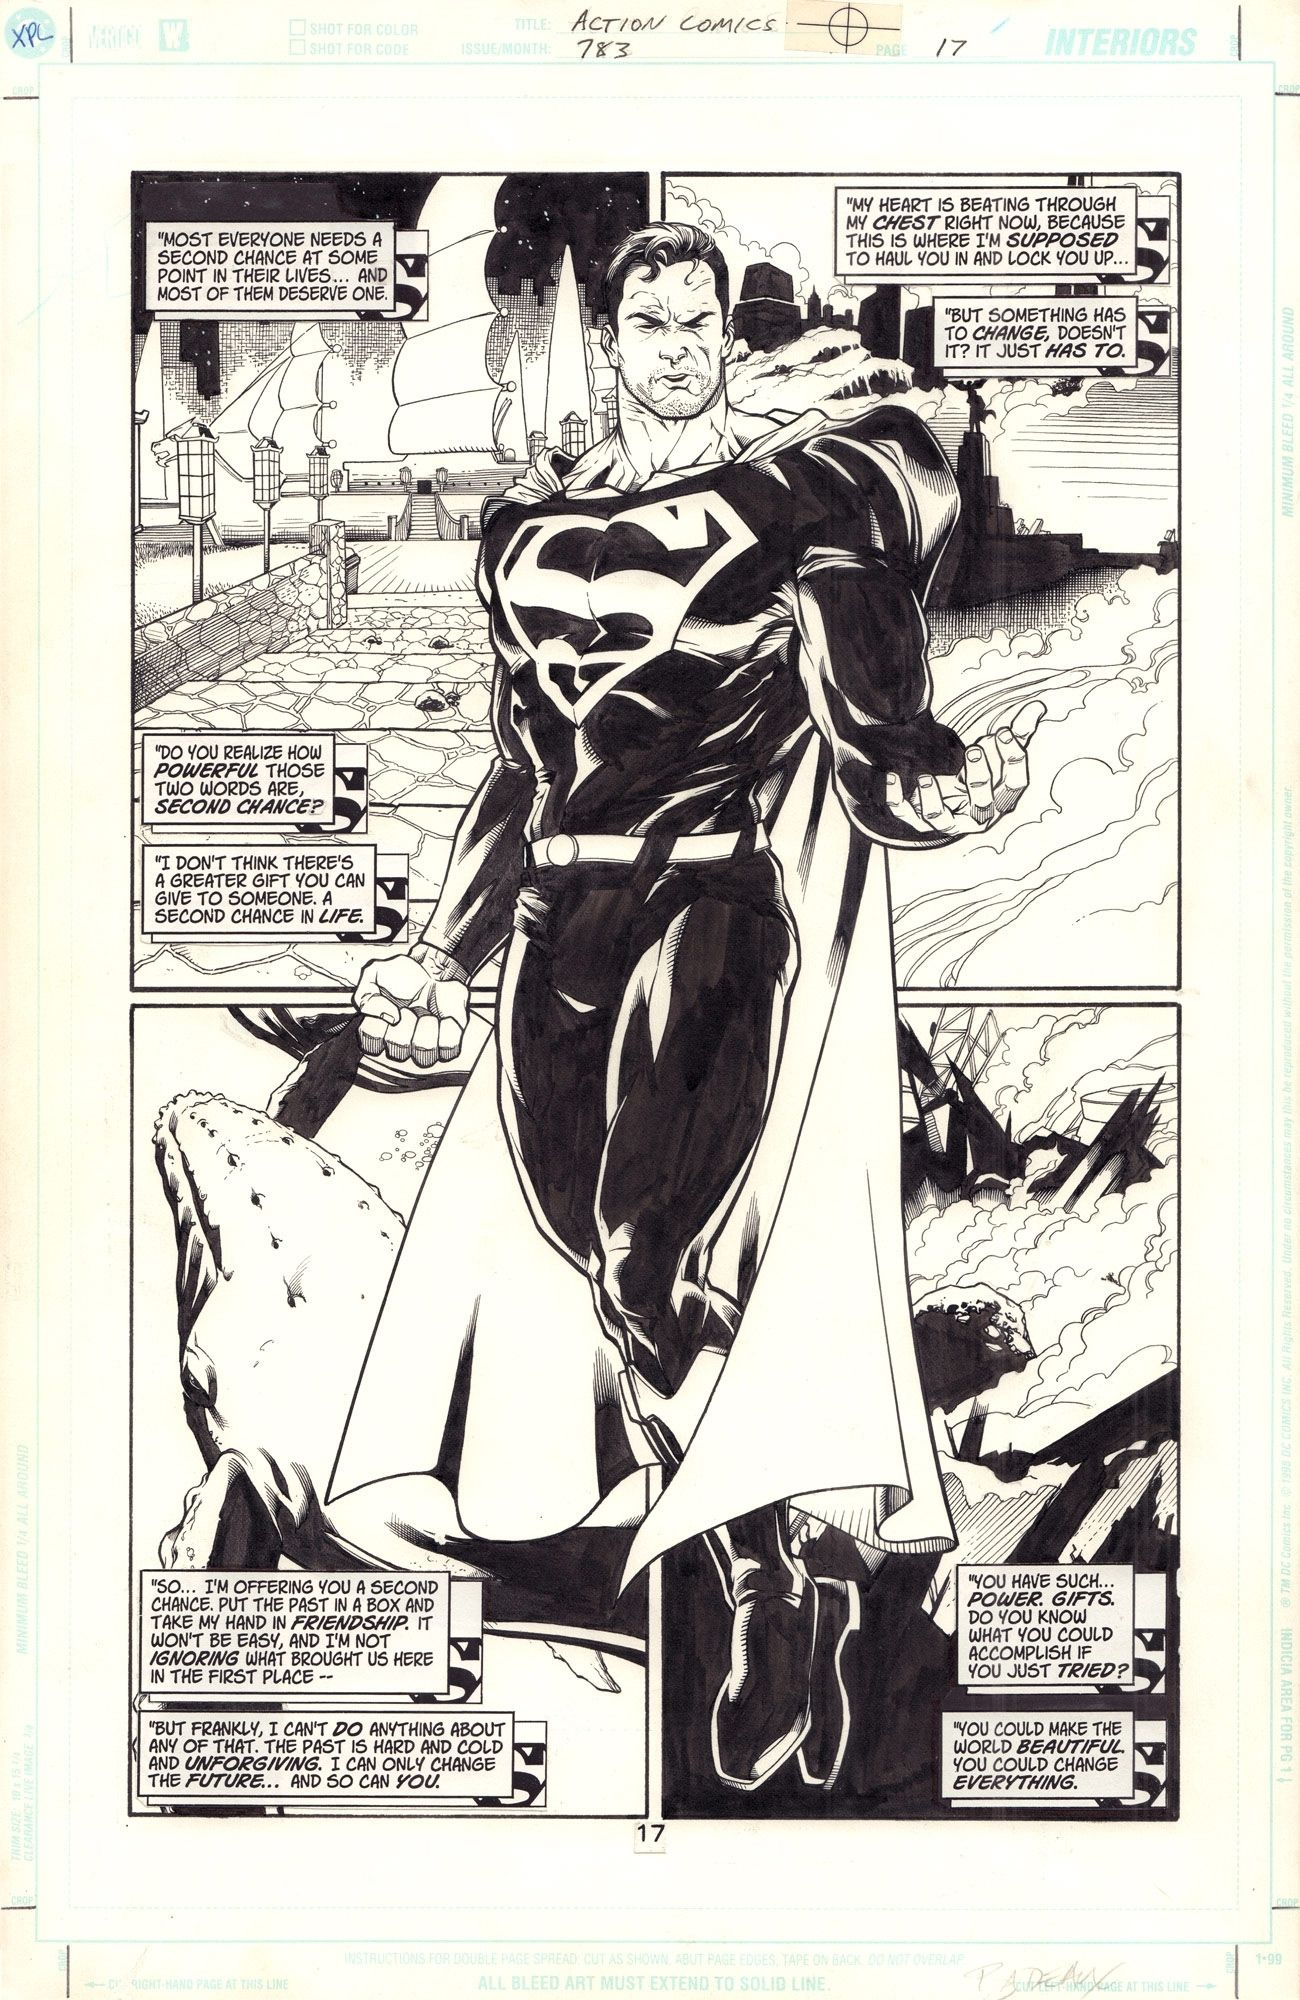 Action Comics #783 / 17